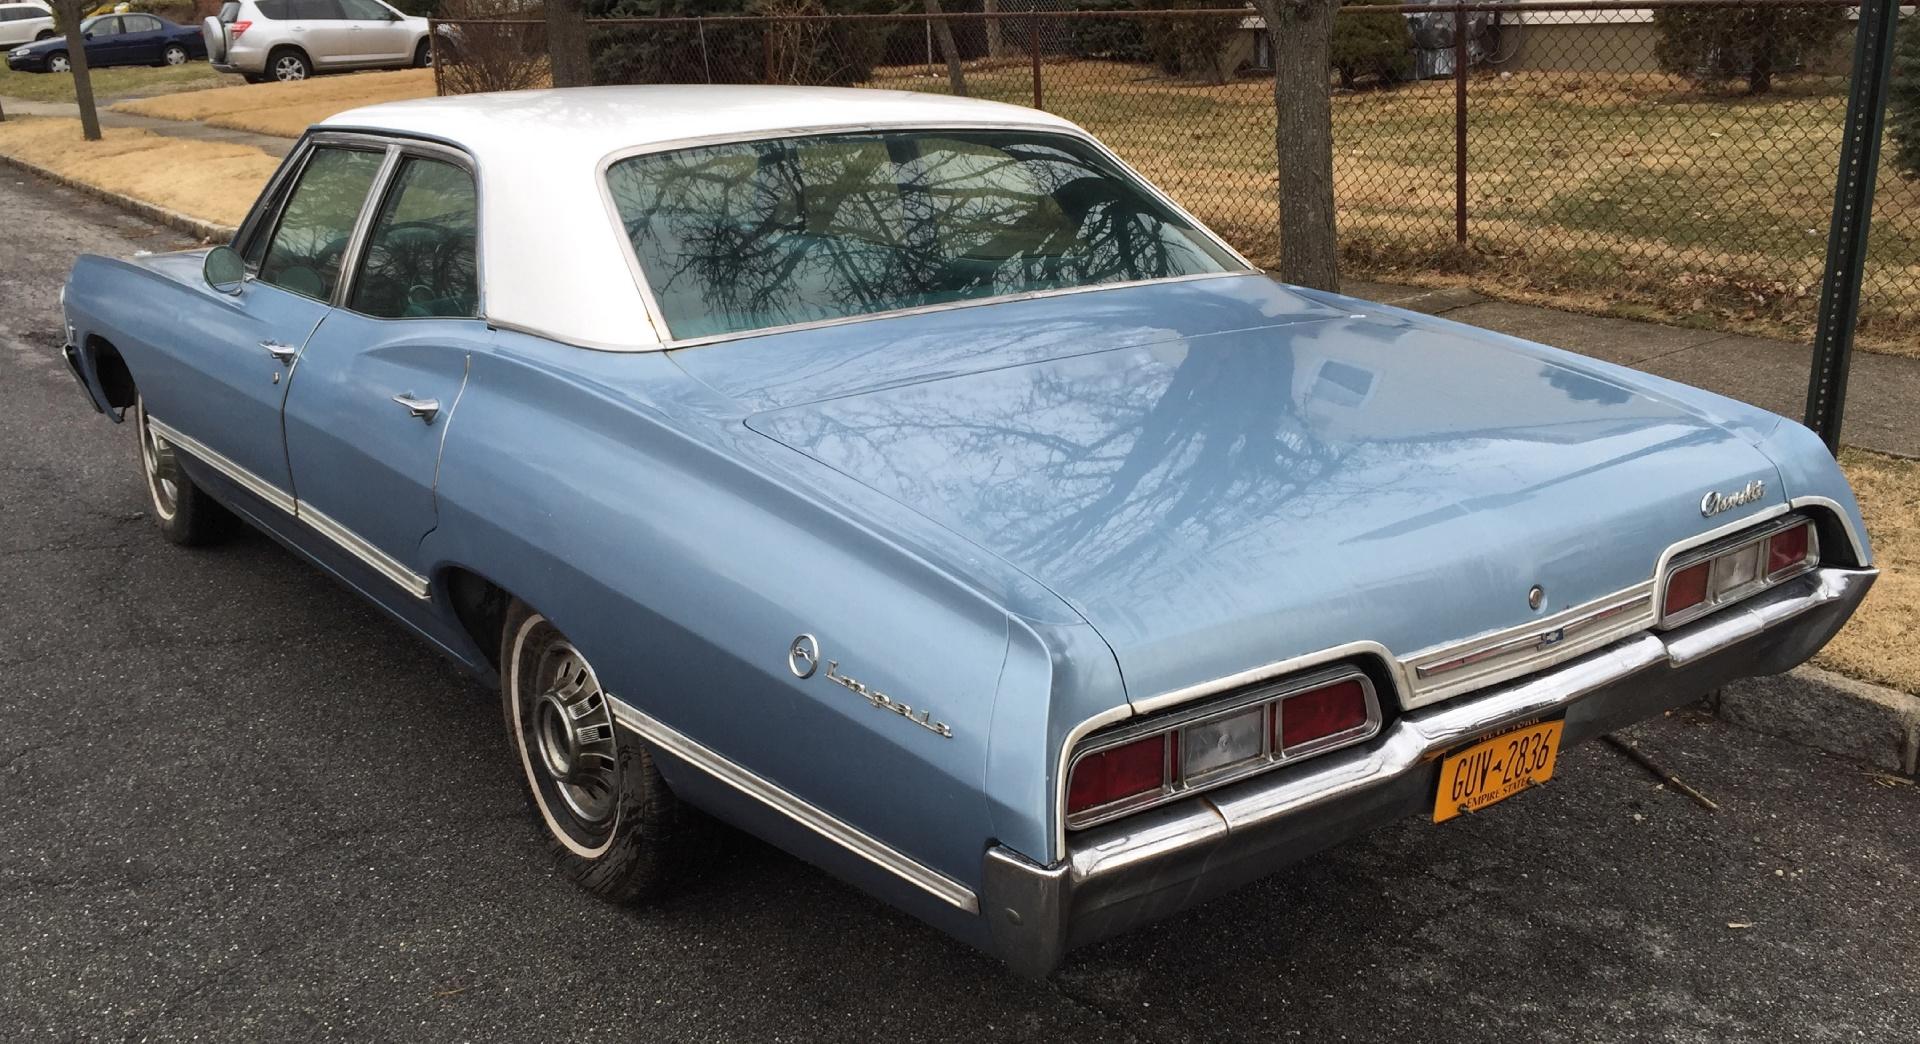 1967 Chevrolet Impala Stock # 67CHEVYIMPALA for sale near New York